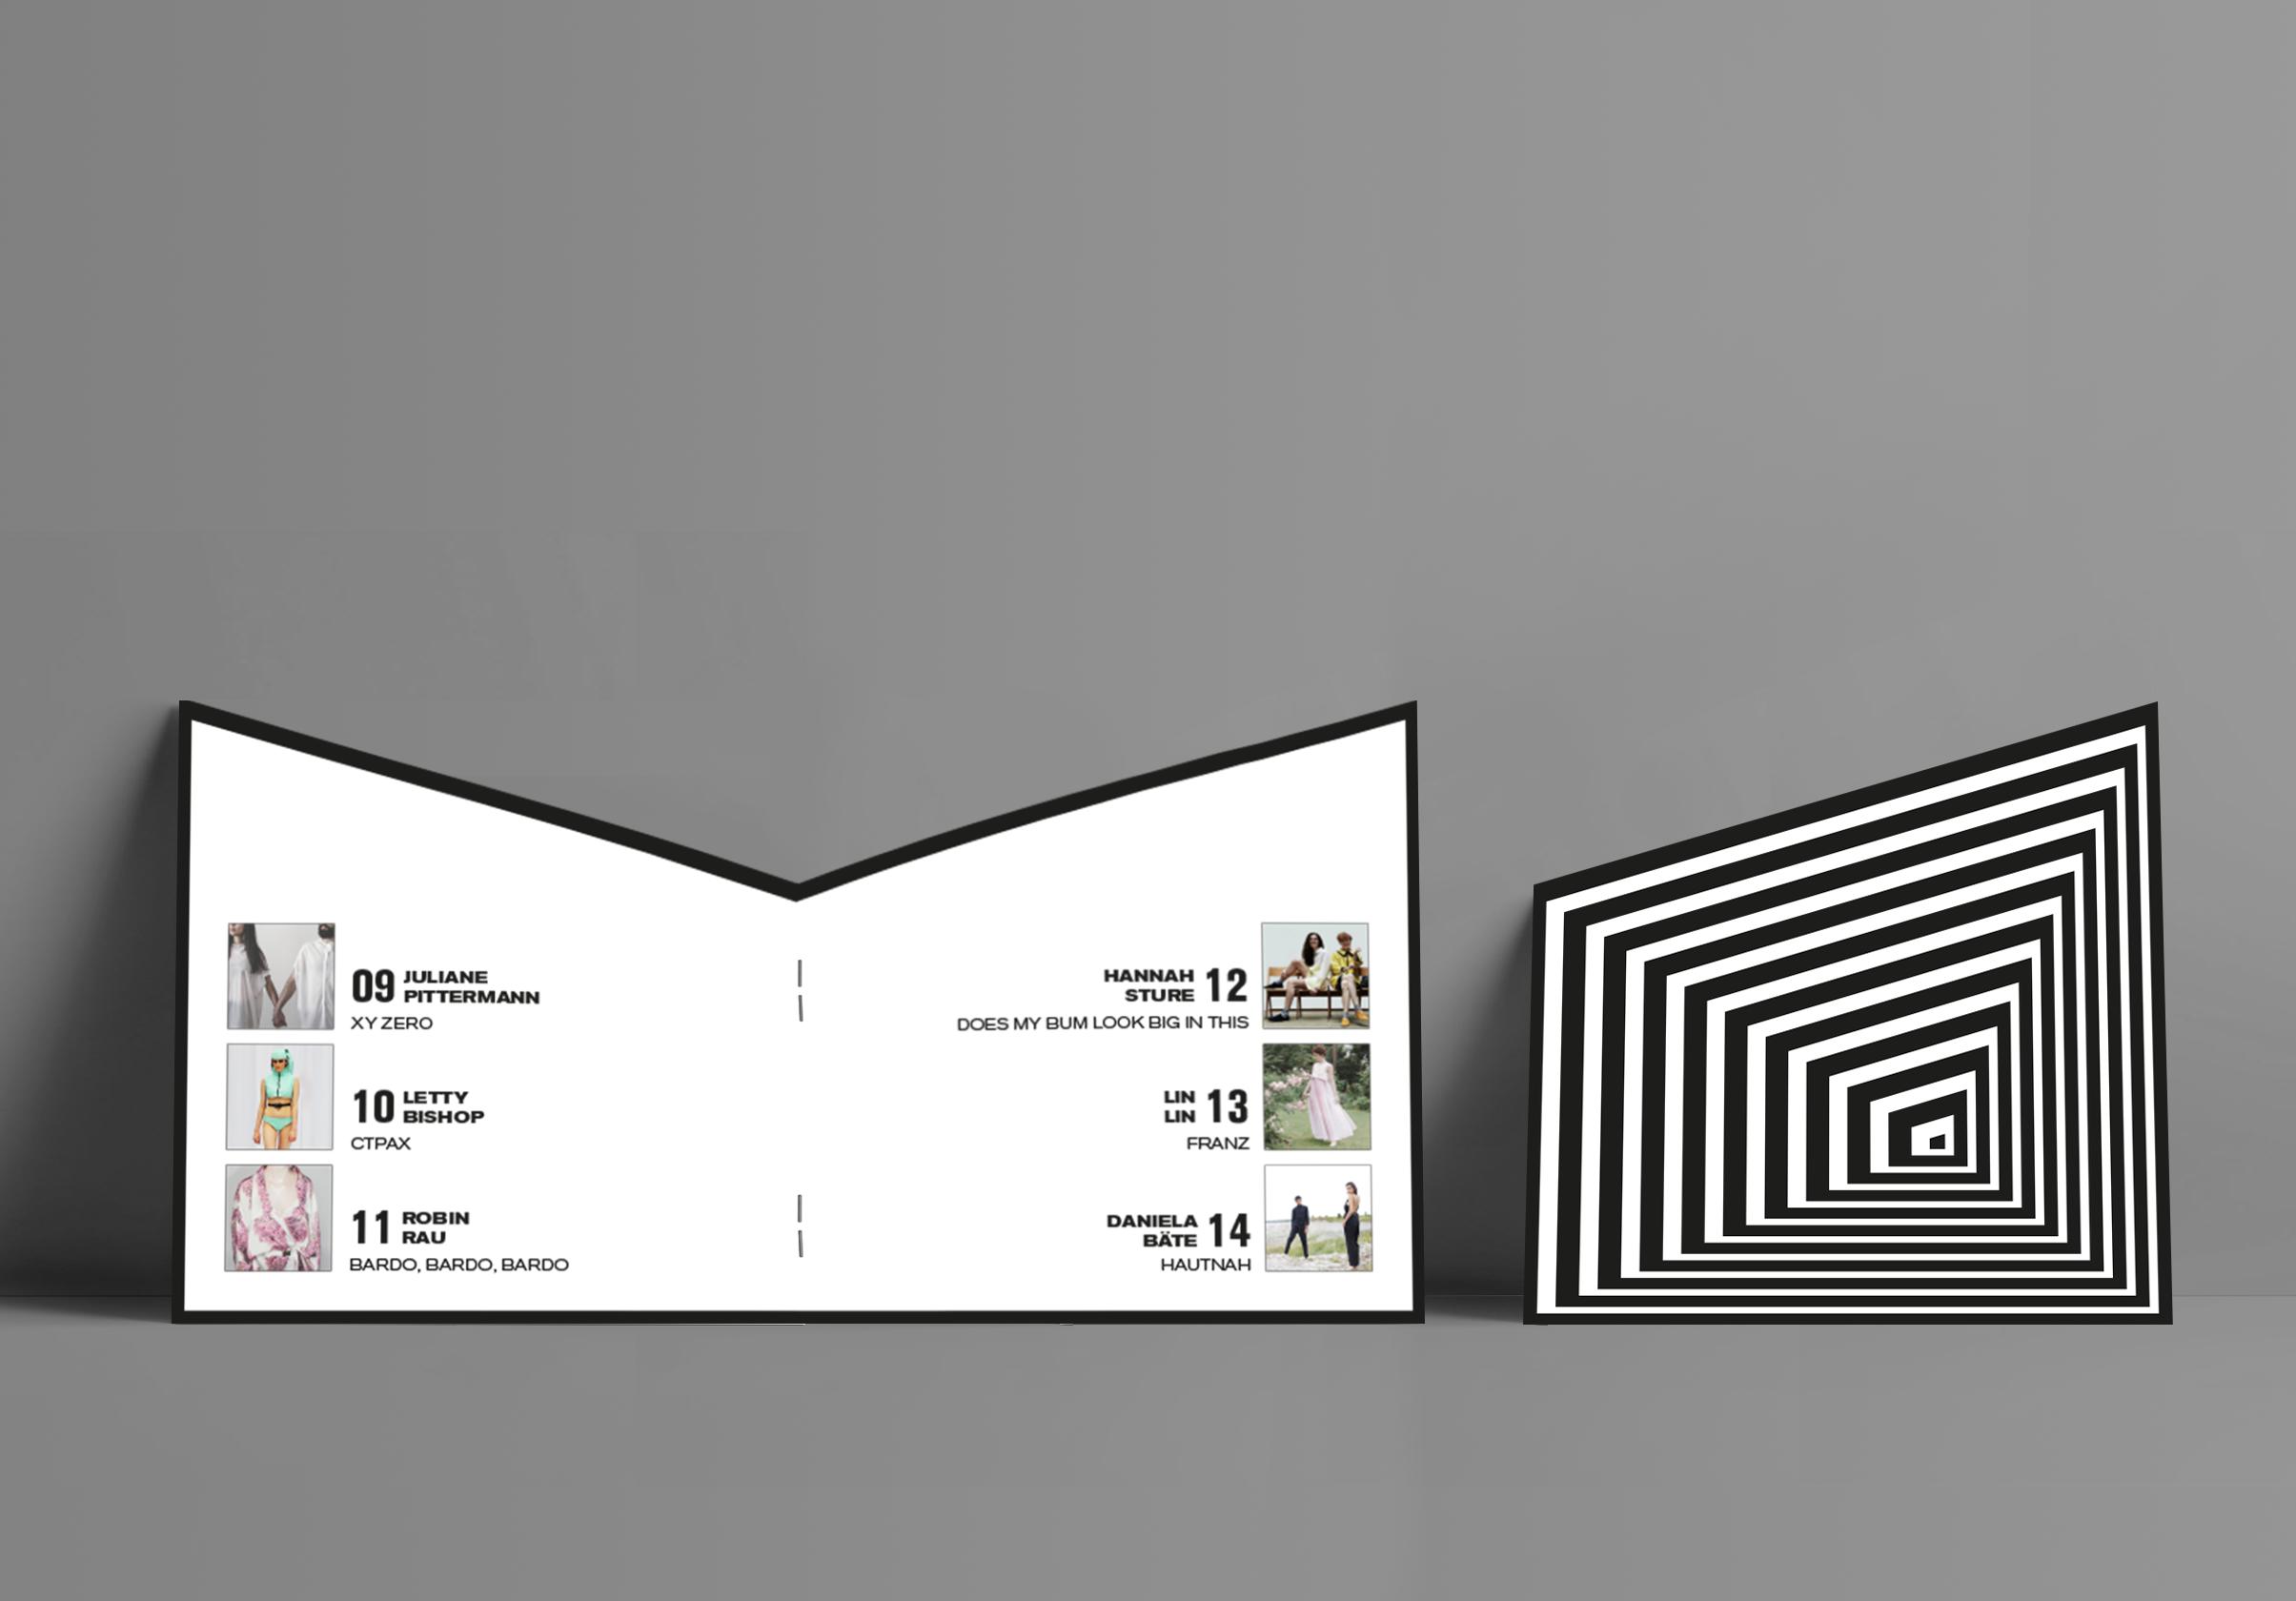 Corporate Design, Brandig, Event Design, Modepreis Hannover Booklet | Freelancer Grafik Design Berlin